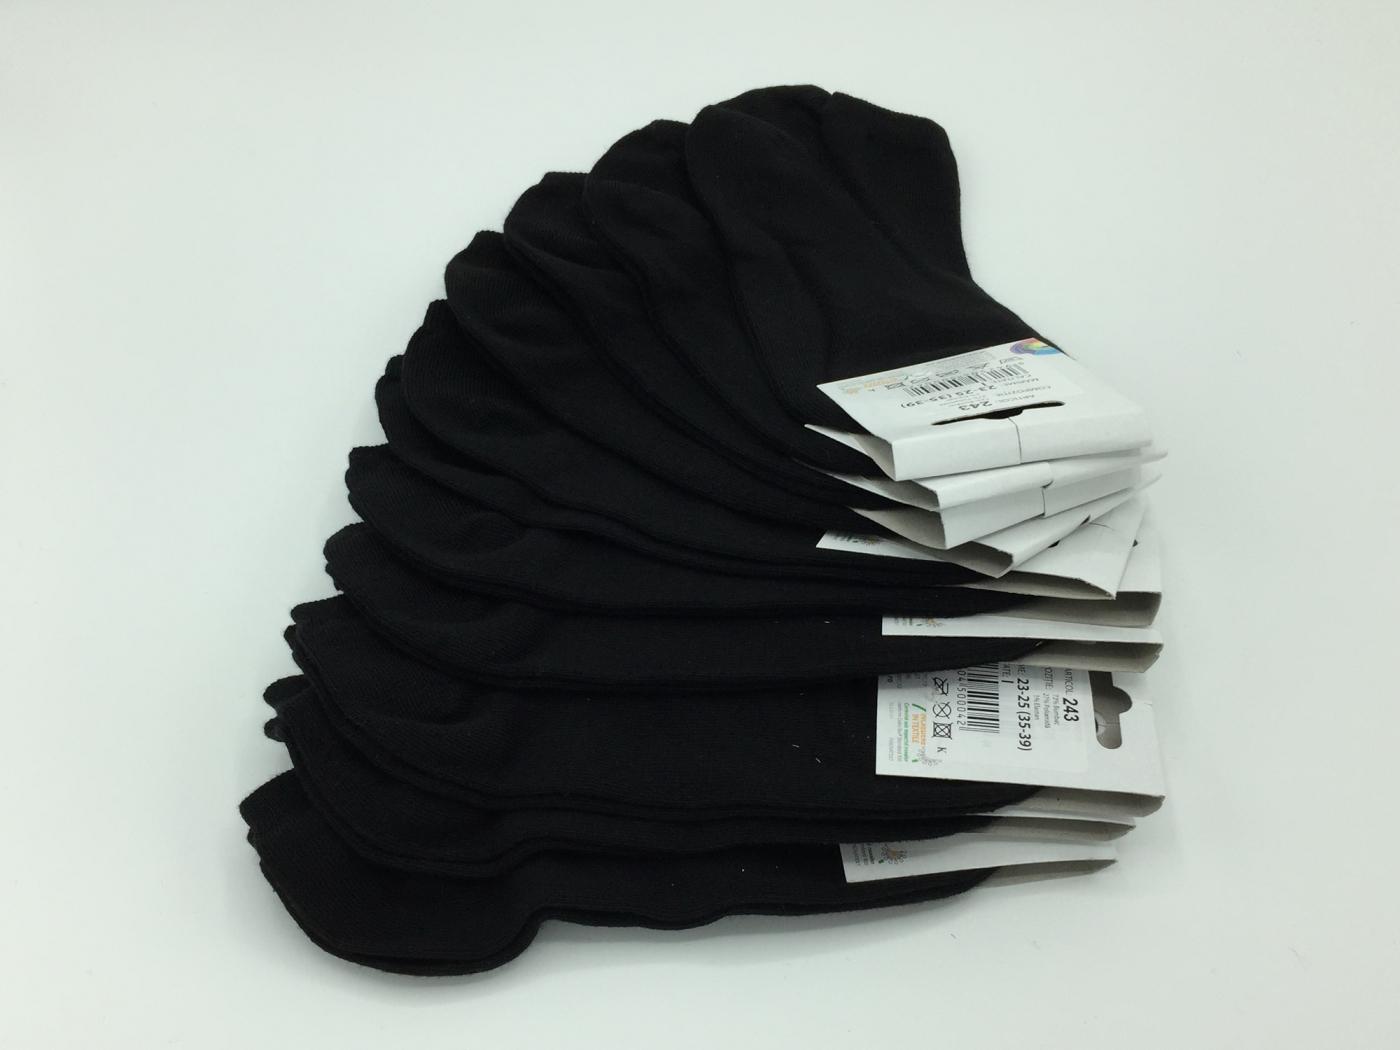 Sosete dama - Negru - set 10 perechi - Ciserom 243 foarte scurt